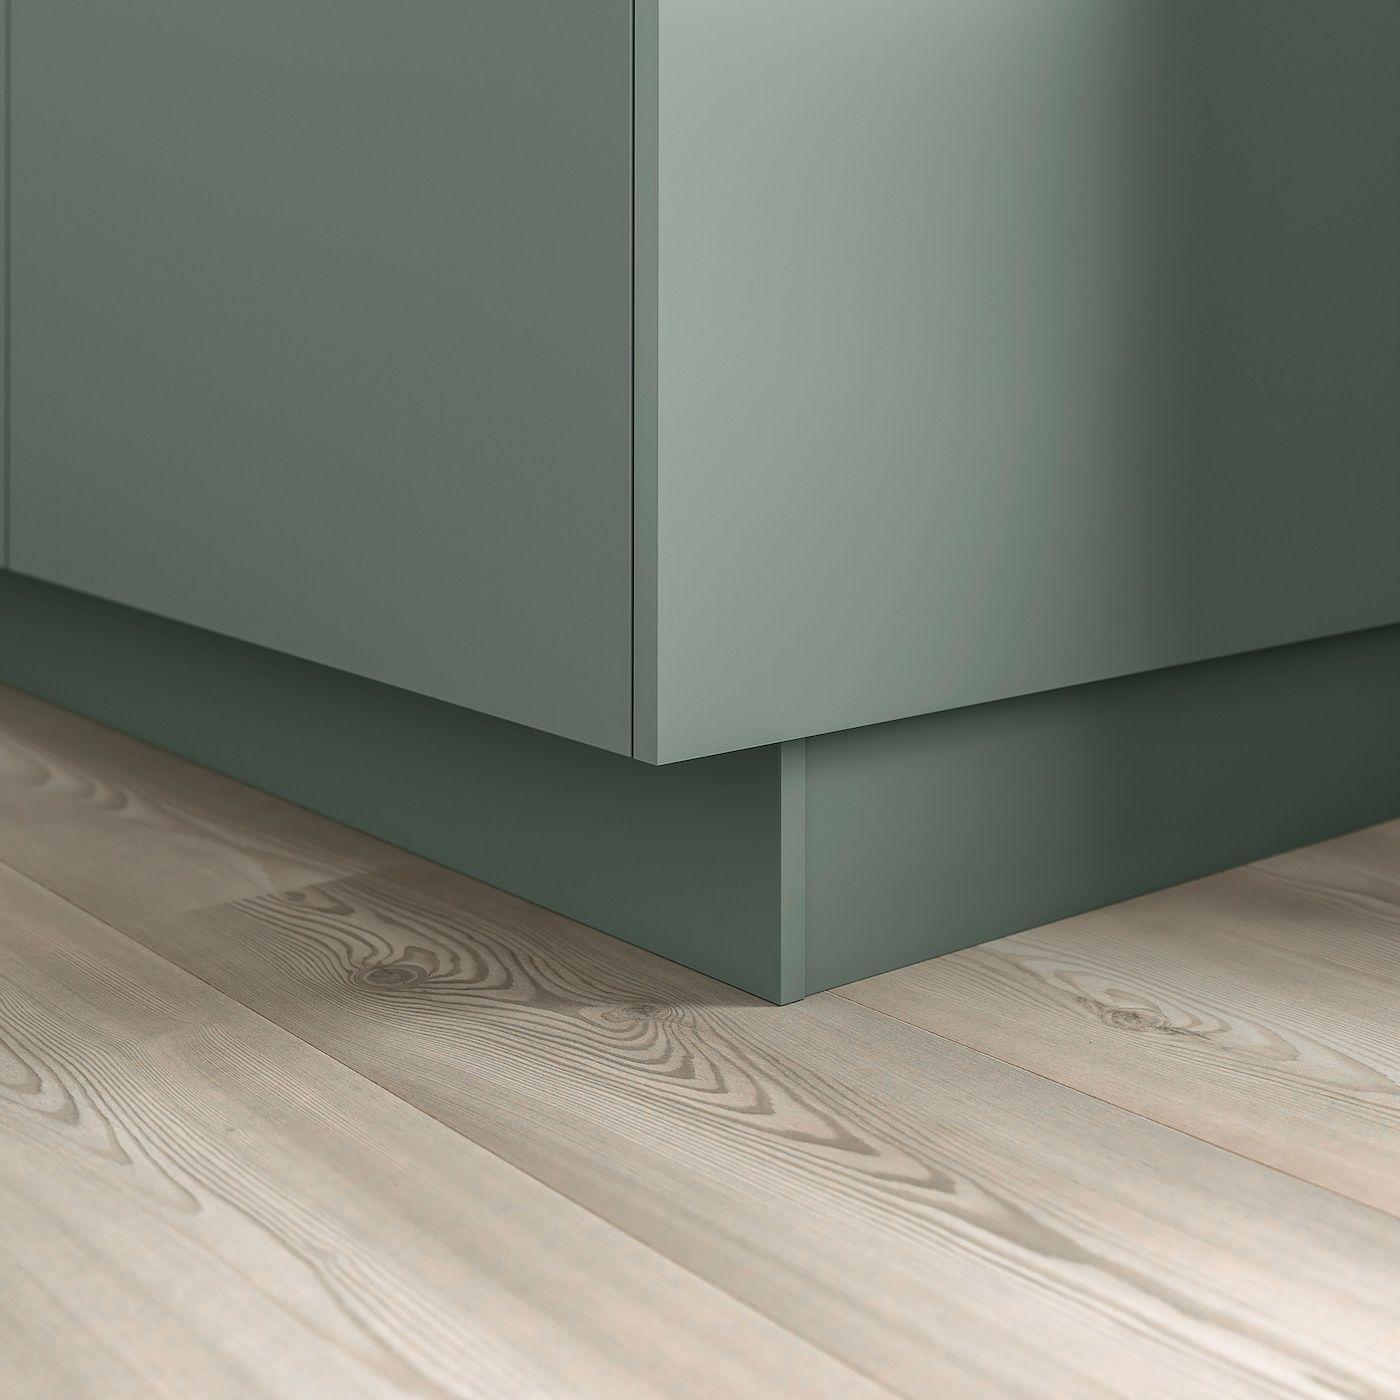 IKEA BODARP Gray-Green Toekick in 2020 | Green, grey, Ikea ...